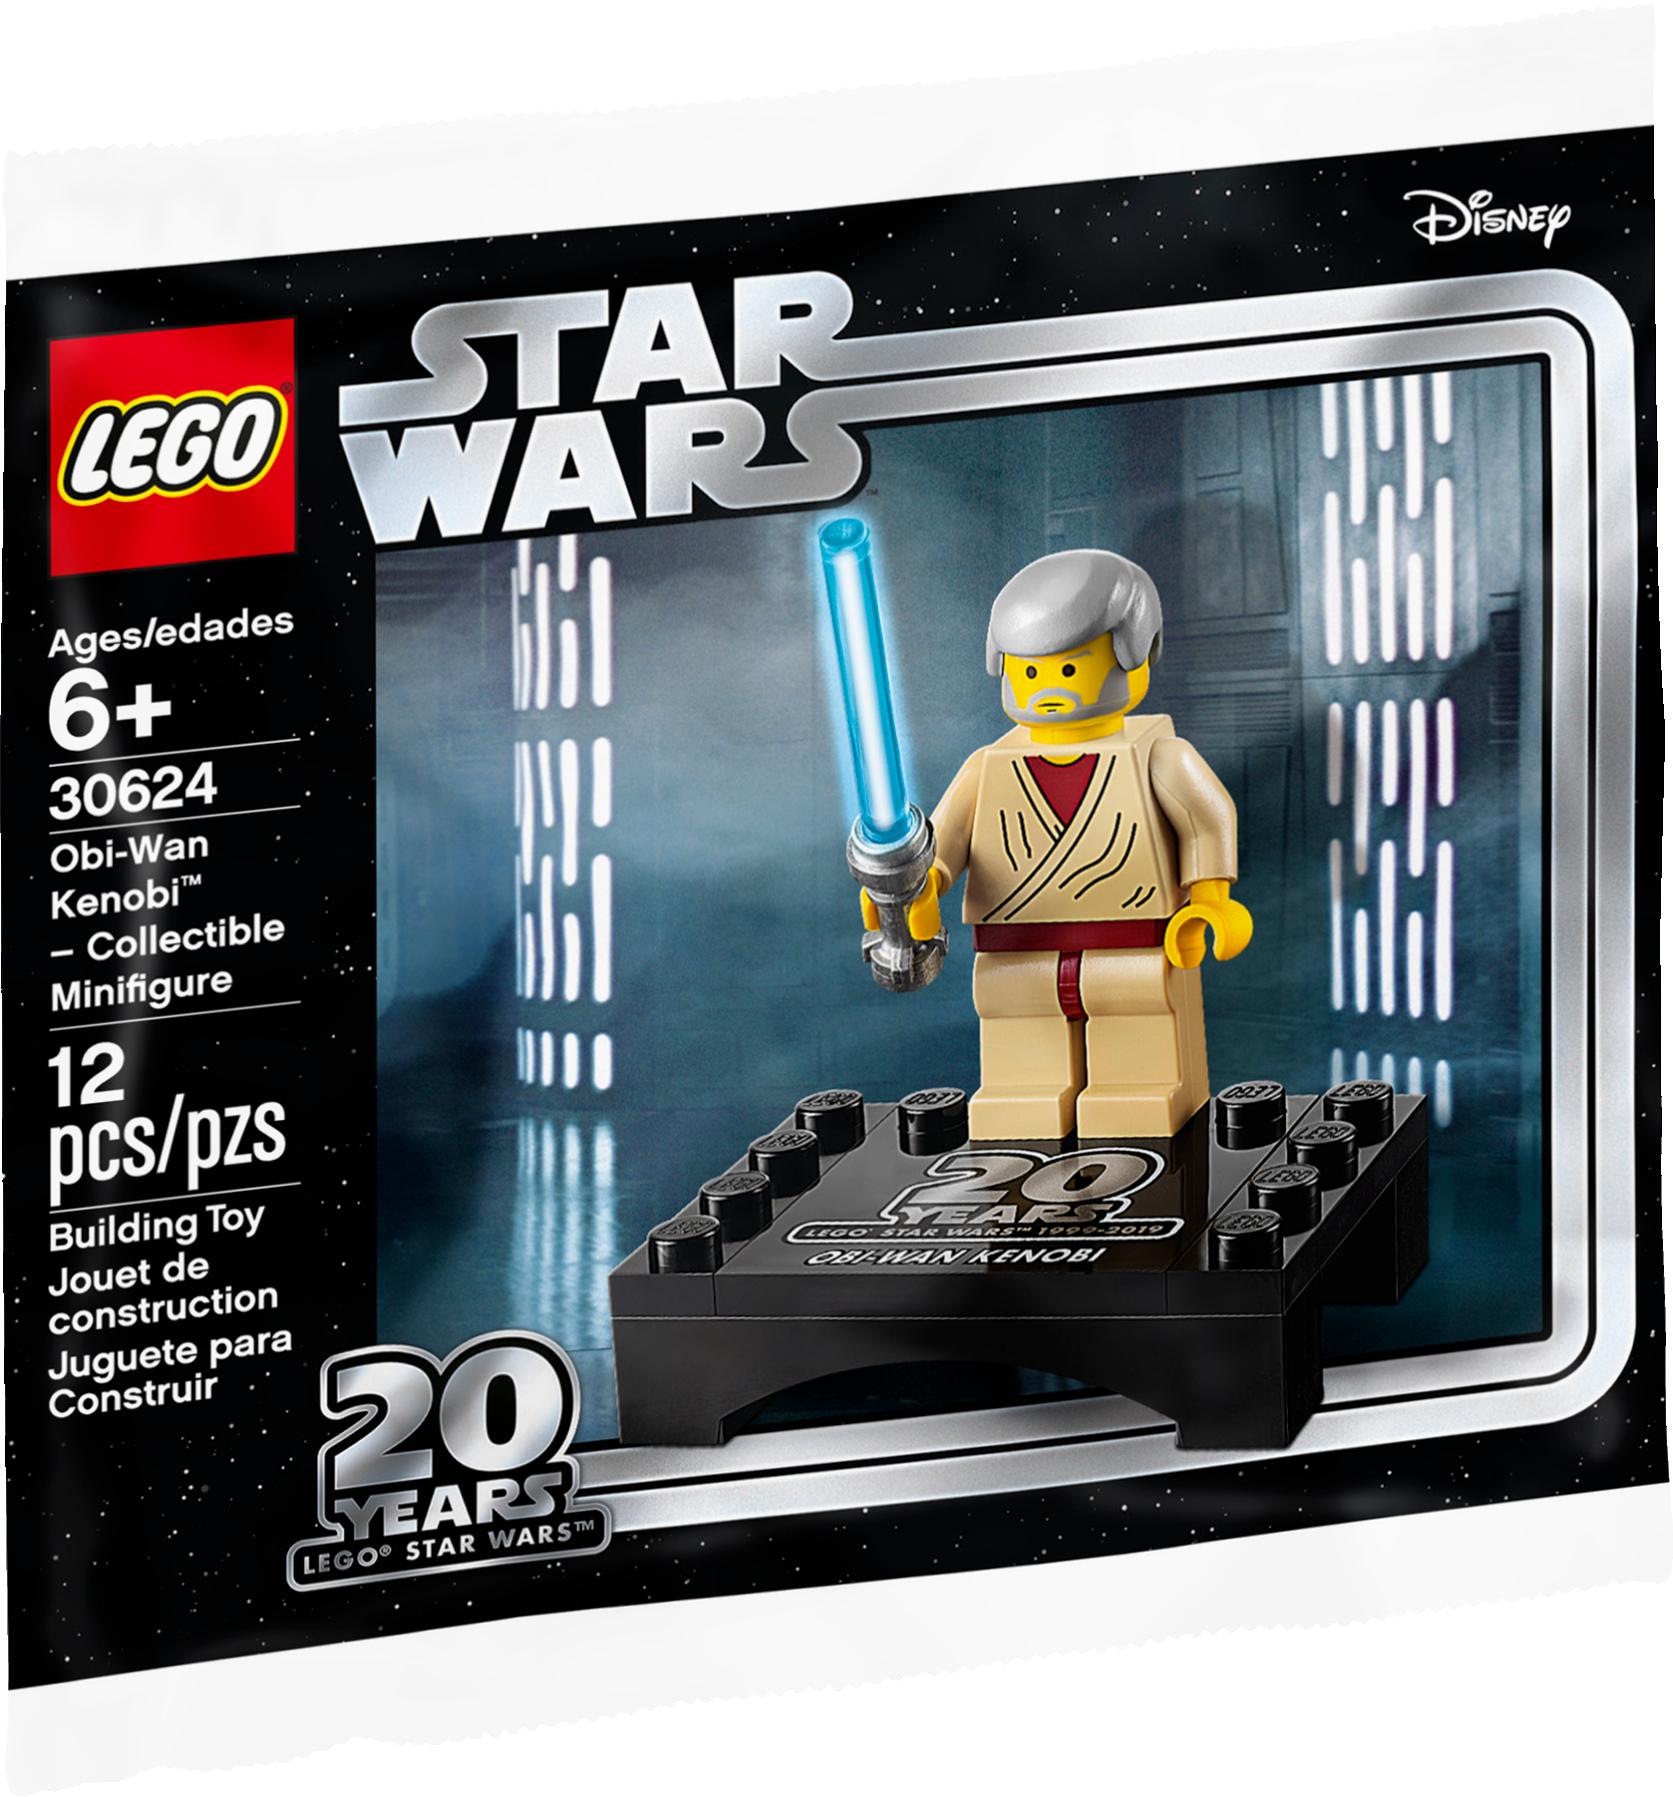 Obi-Wan Kenobi - Collectable Minifigure